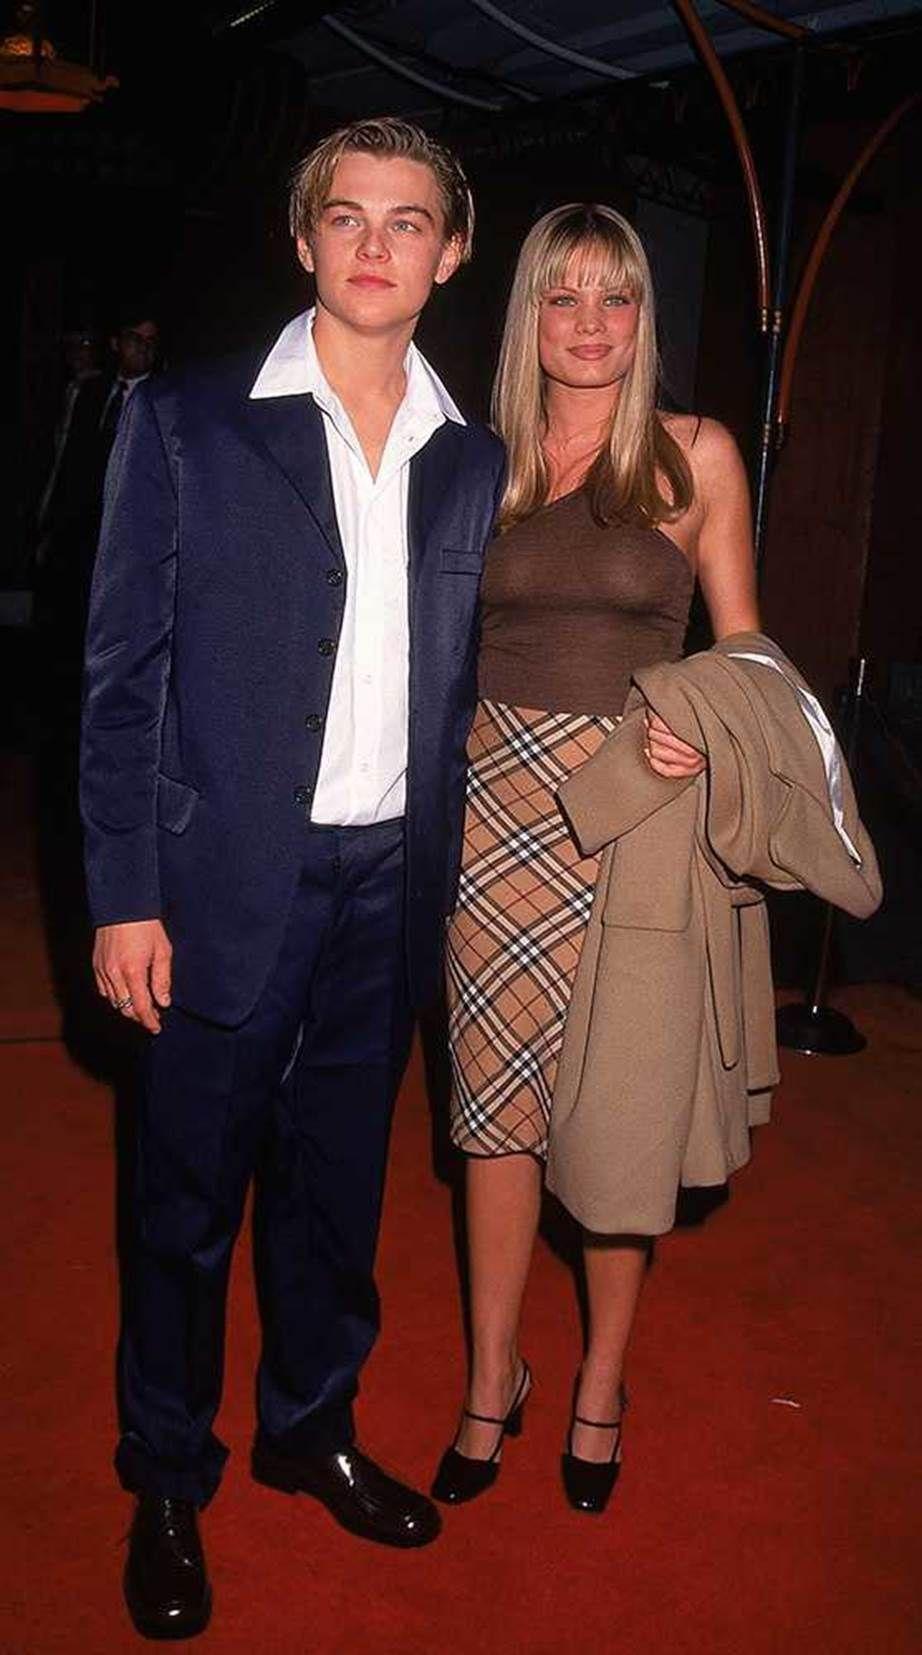 مع كريستين زانج